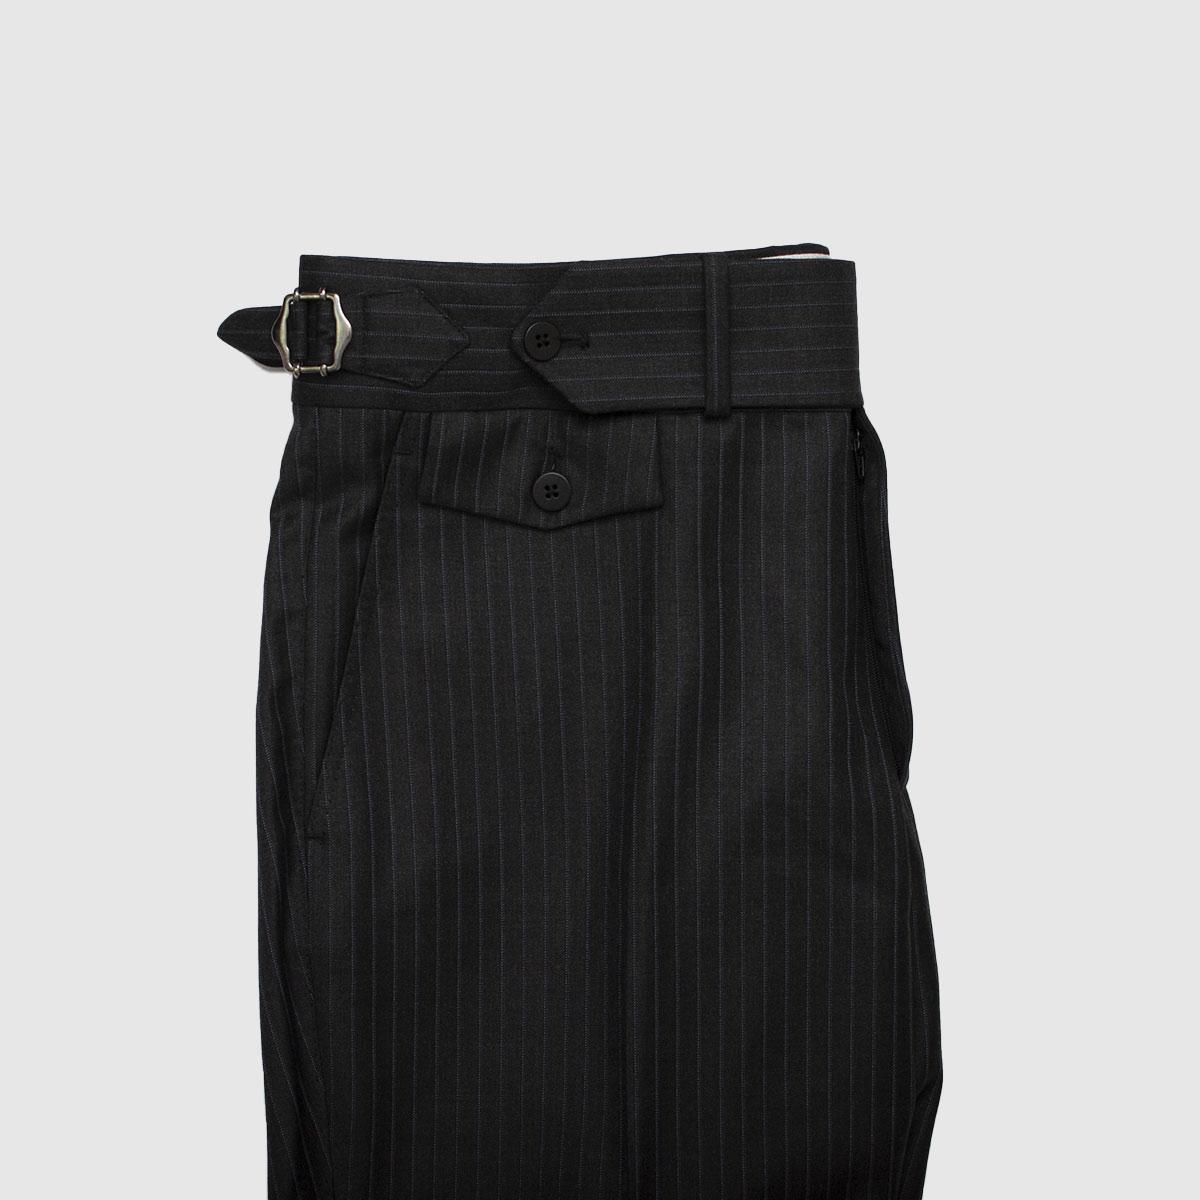 Pantalone 100% Lana a vita alta grigio antracite